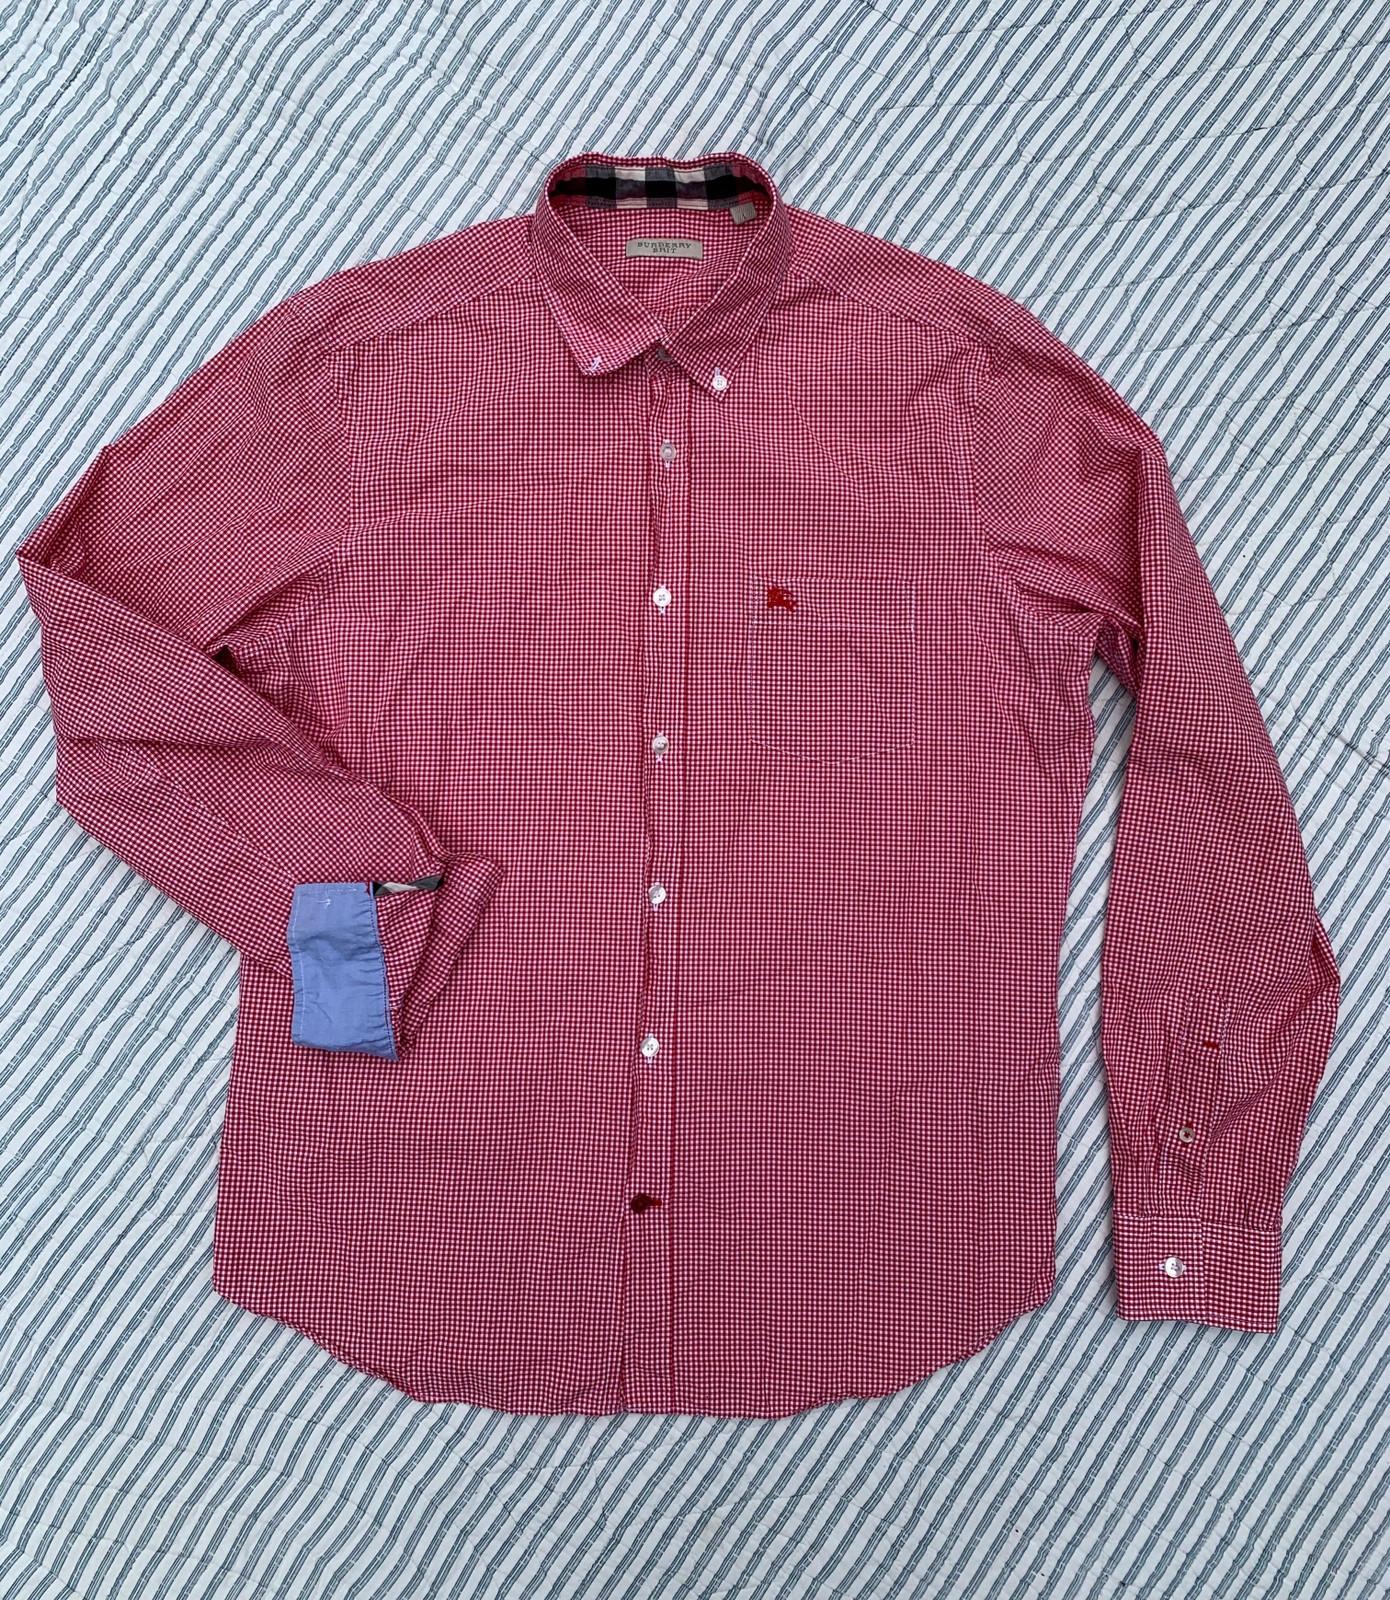 Pen skjorte str. XL | FINN.no